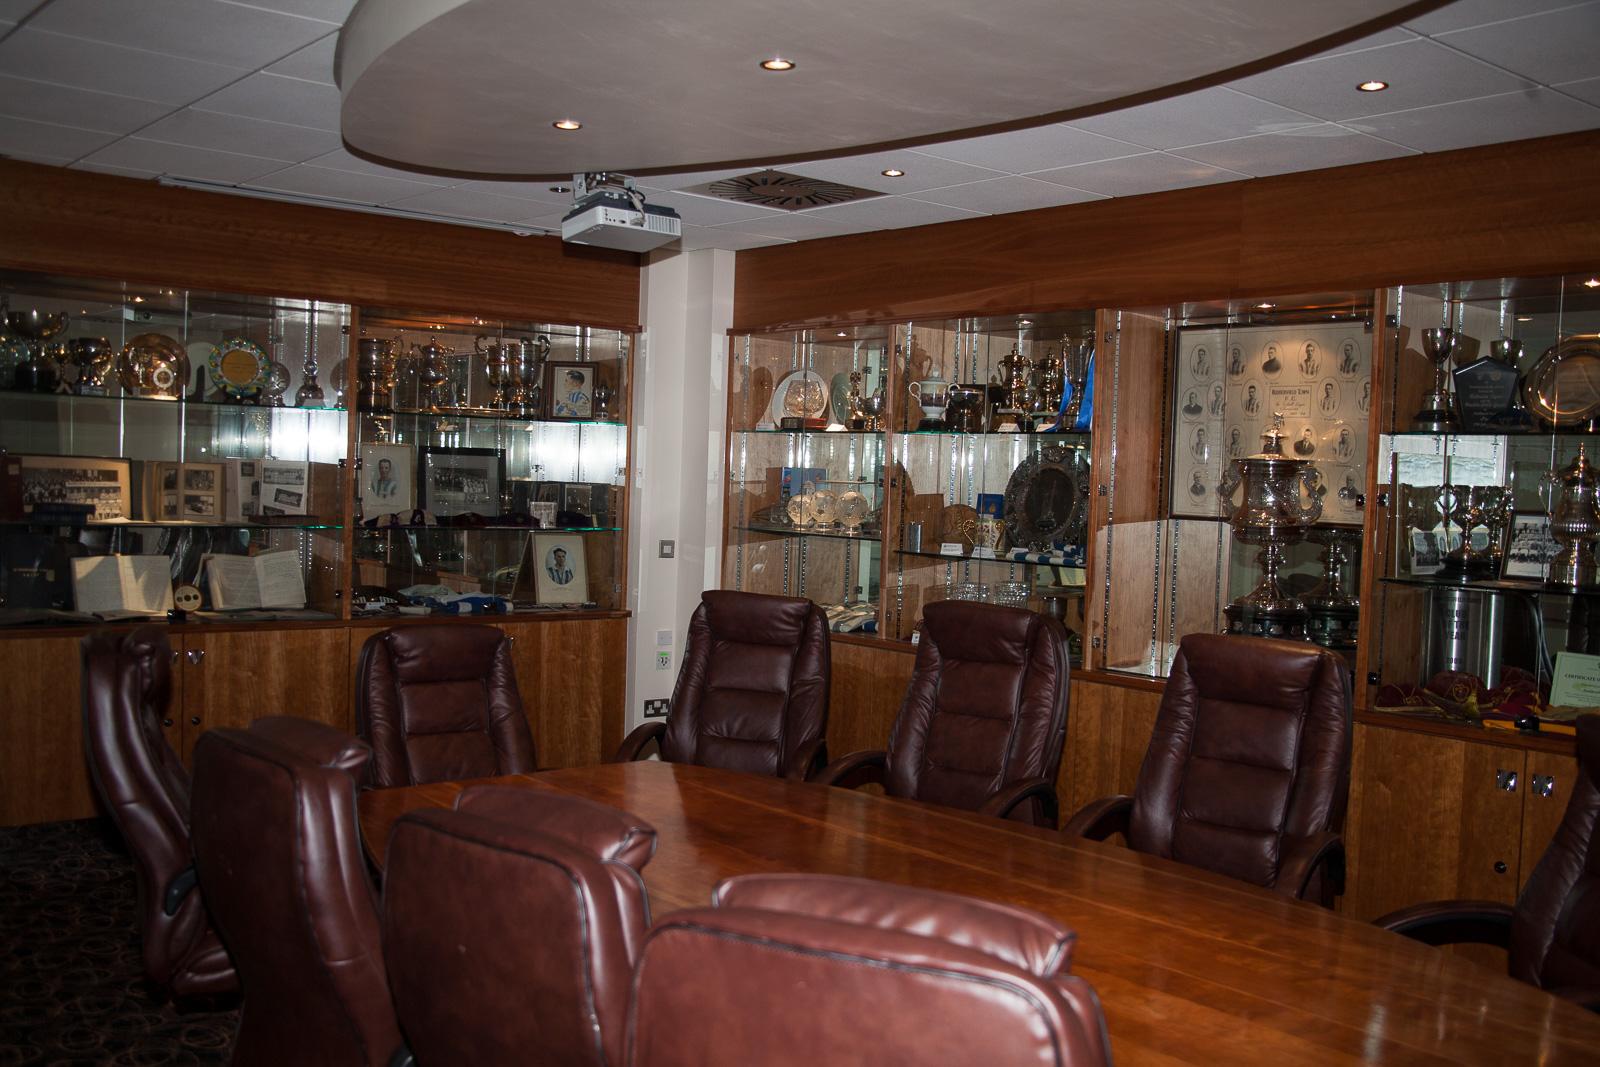 The_Boardroom_-002.jpg